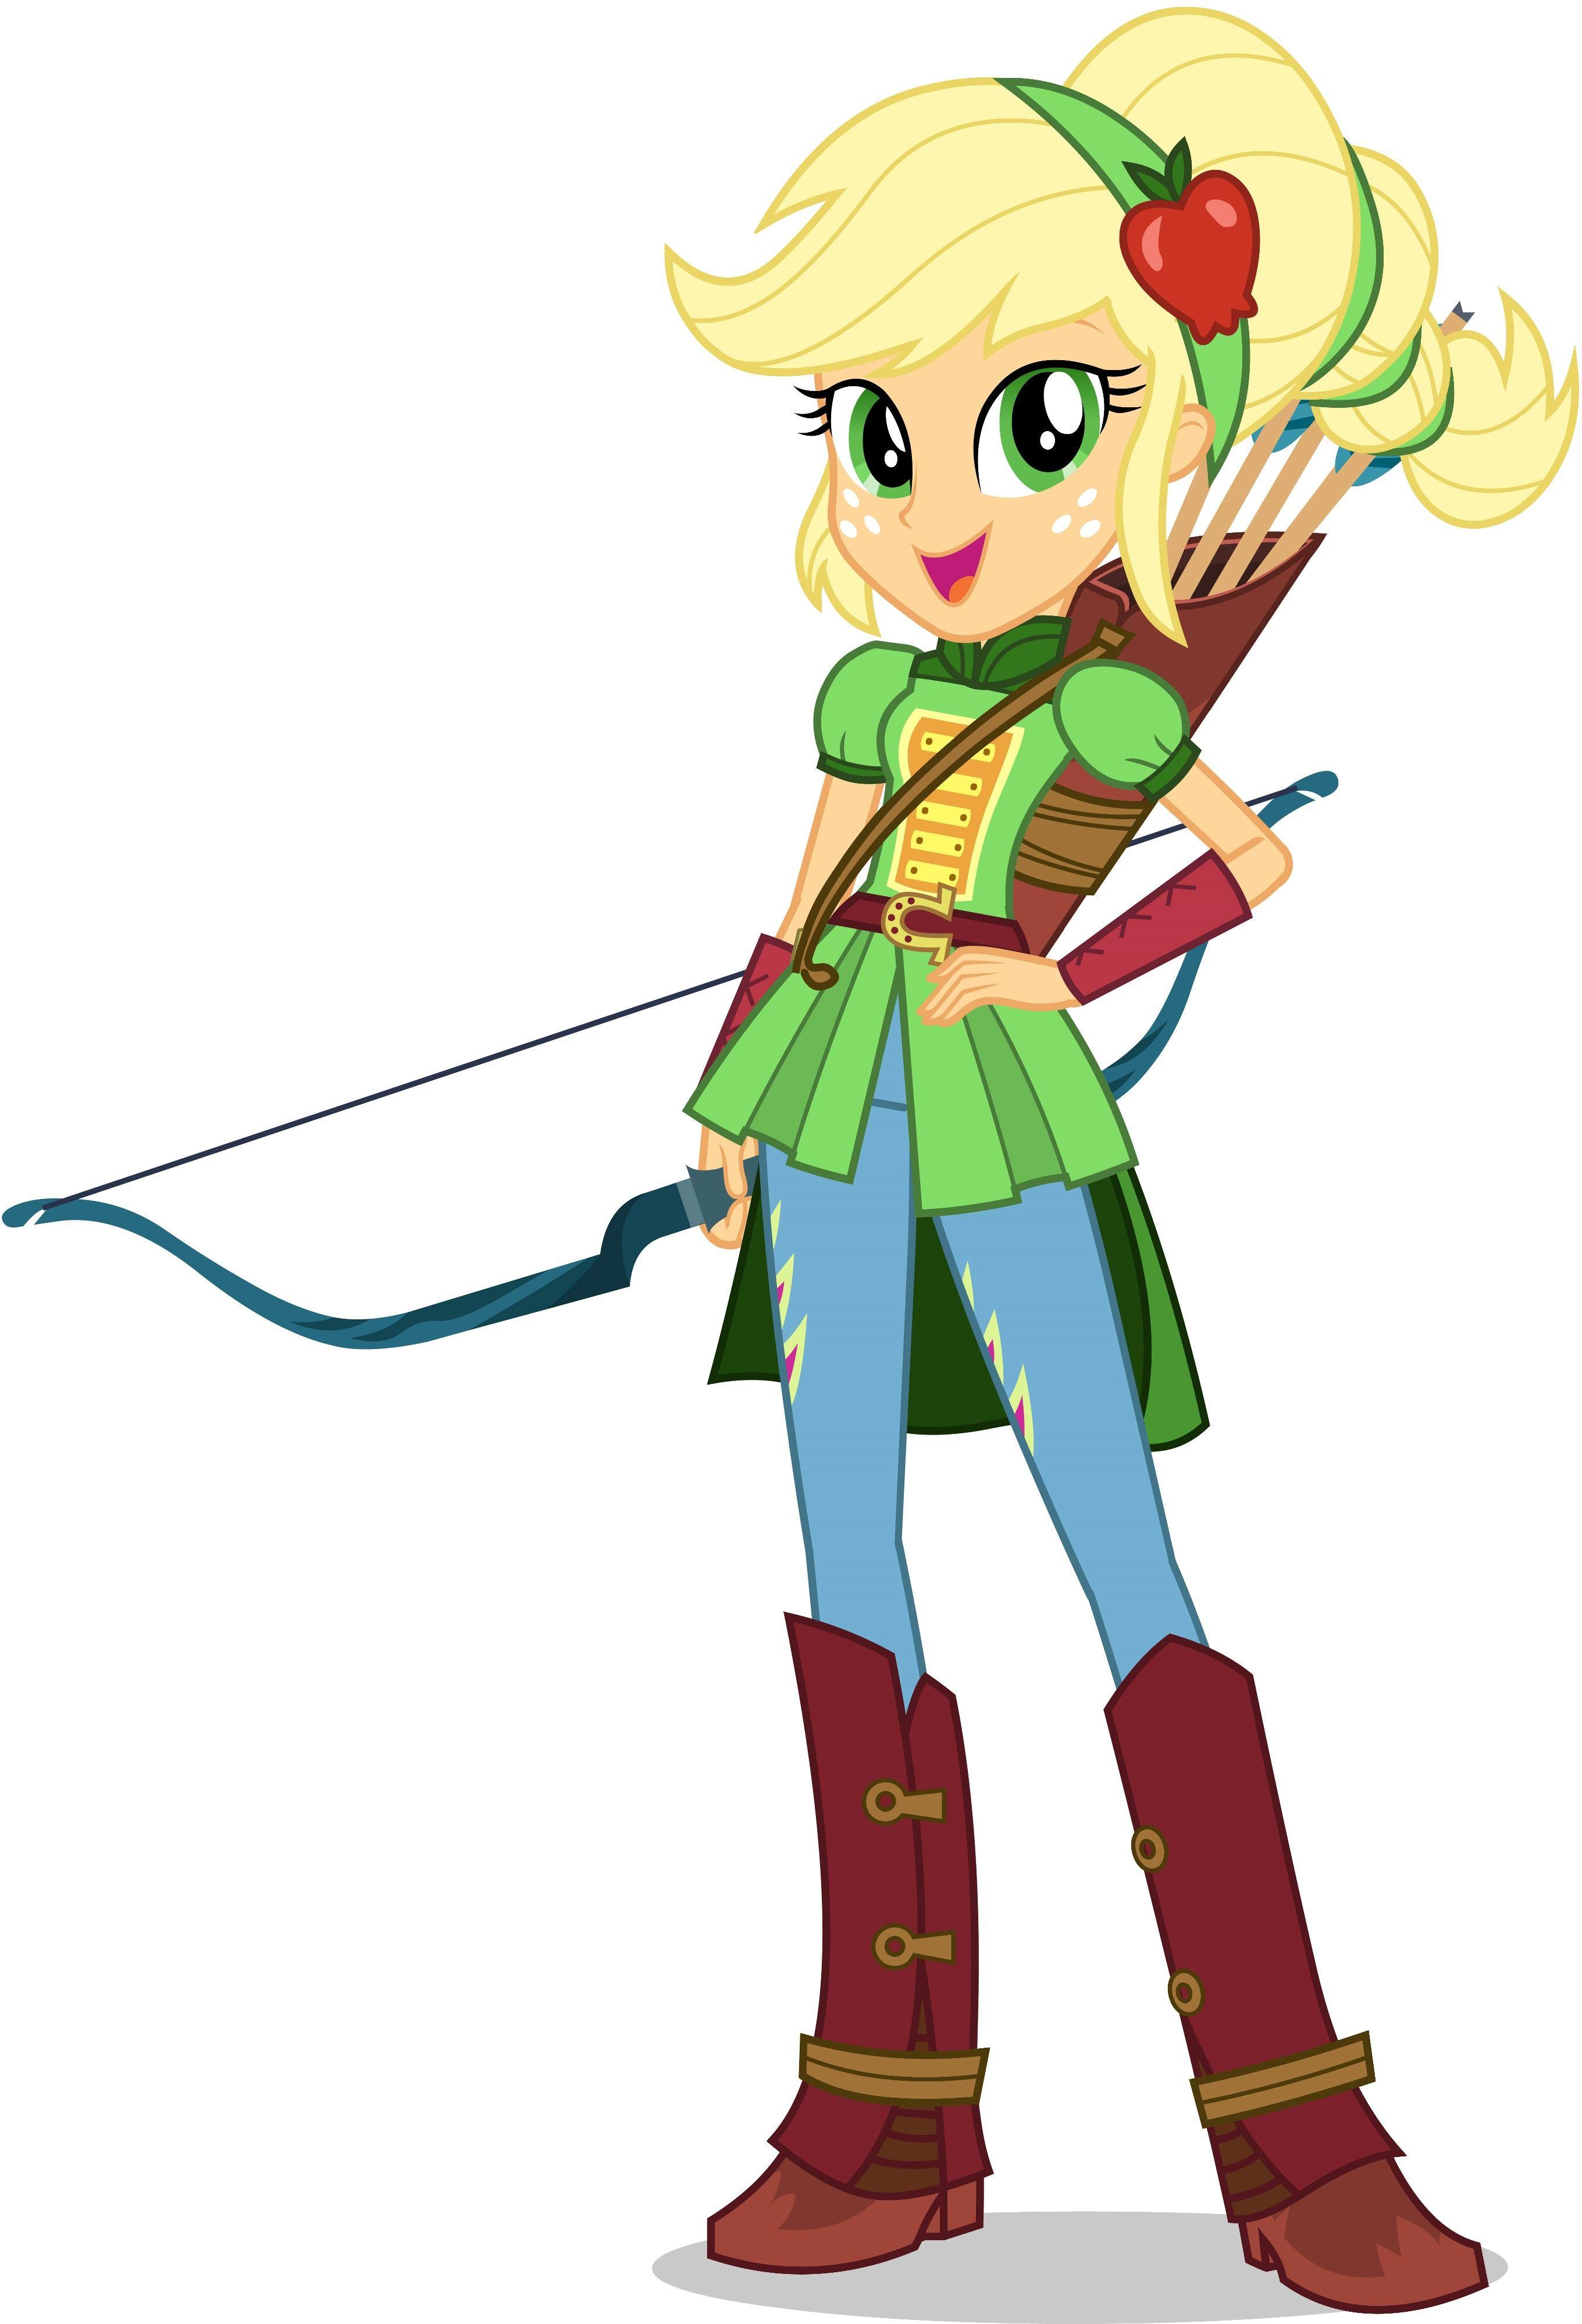 Loving The Apple Headband On Applejack In The Friendship Games My Little Pony Applejack Little Pony Mlp My Little Pony